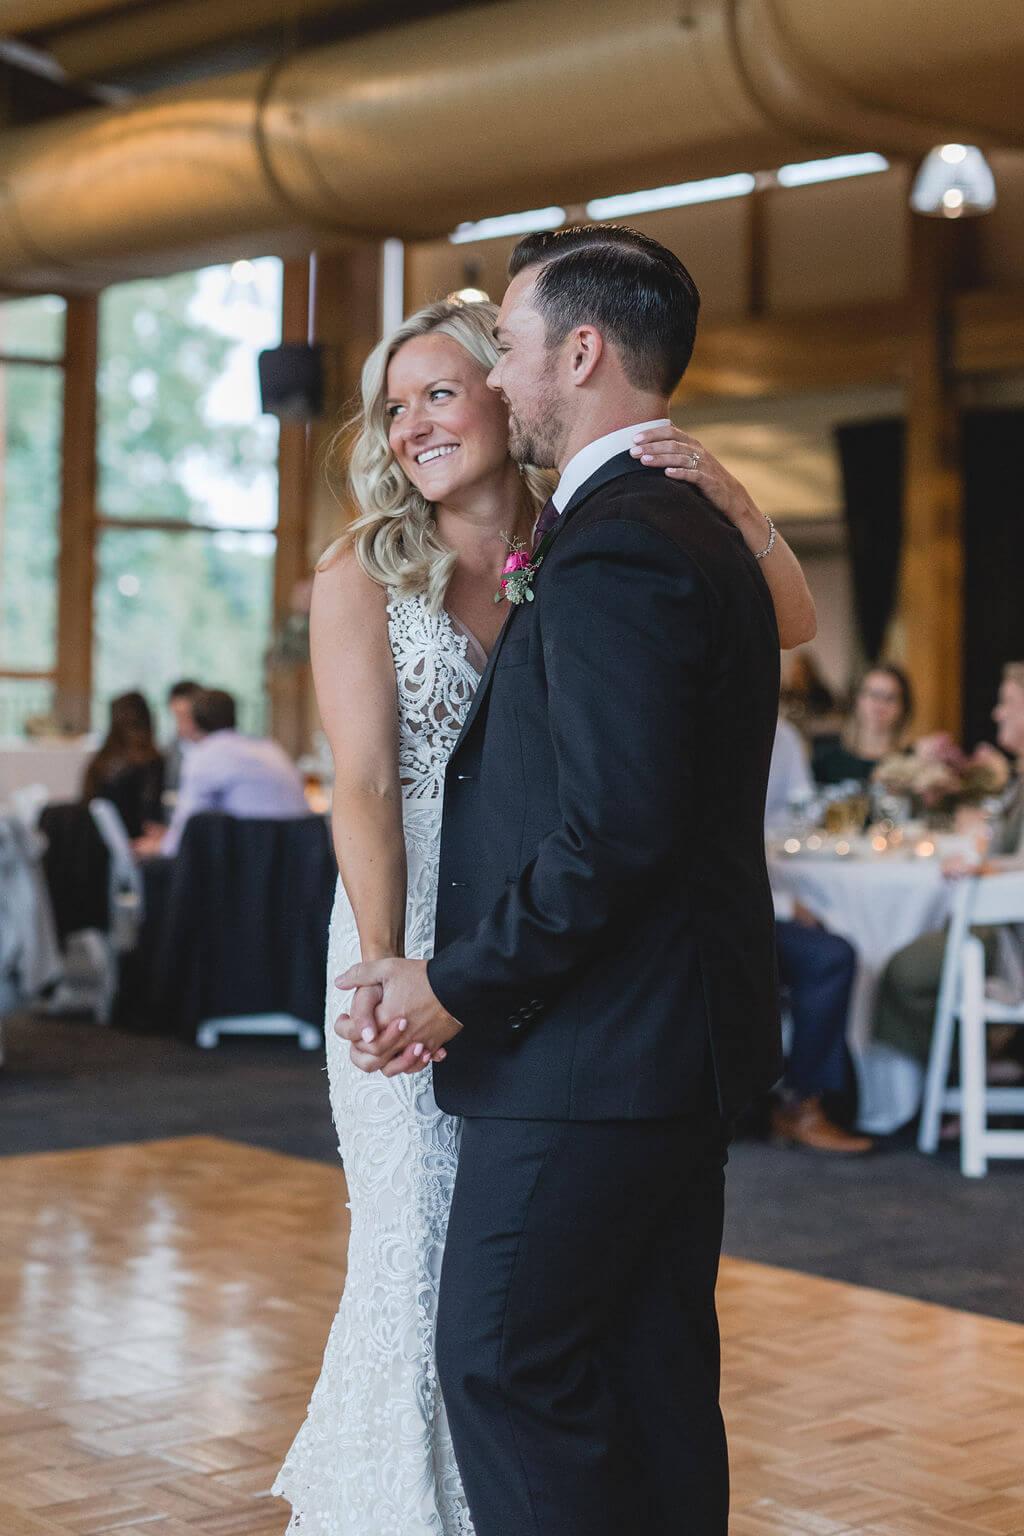 Ashley and Tom | Mariah Brink Photo | Hyland Hills Wedding | Sixpence MN wedding planner | first dance